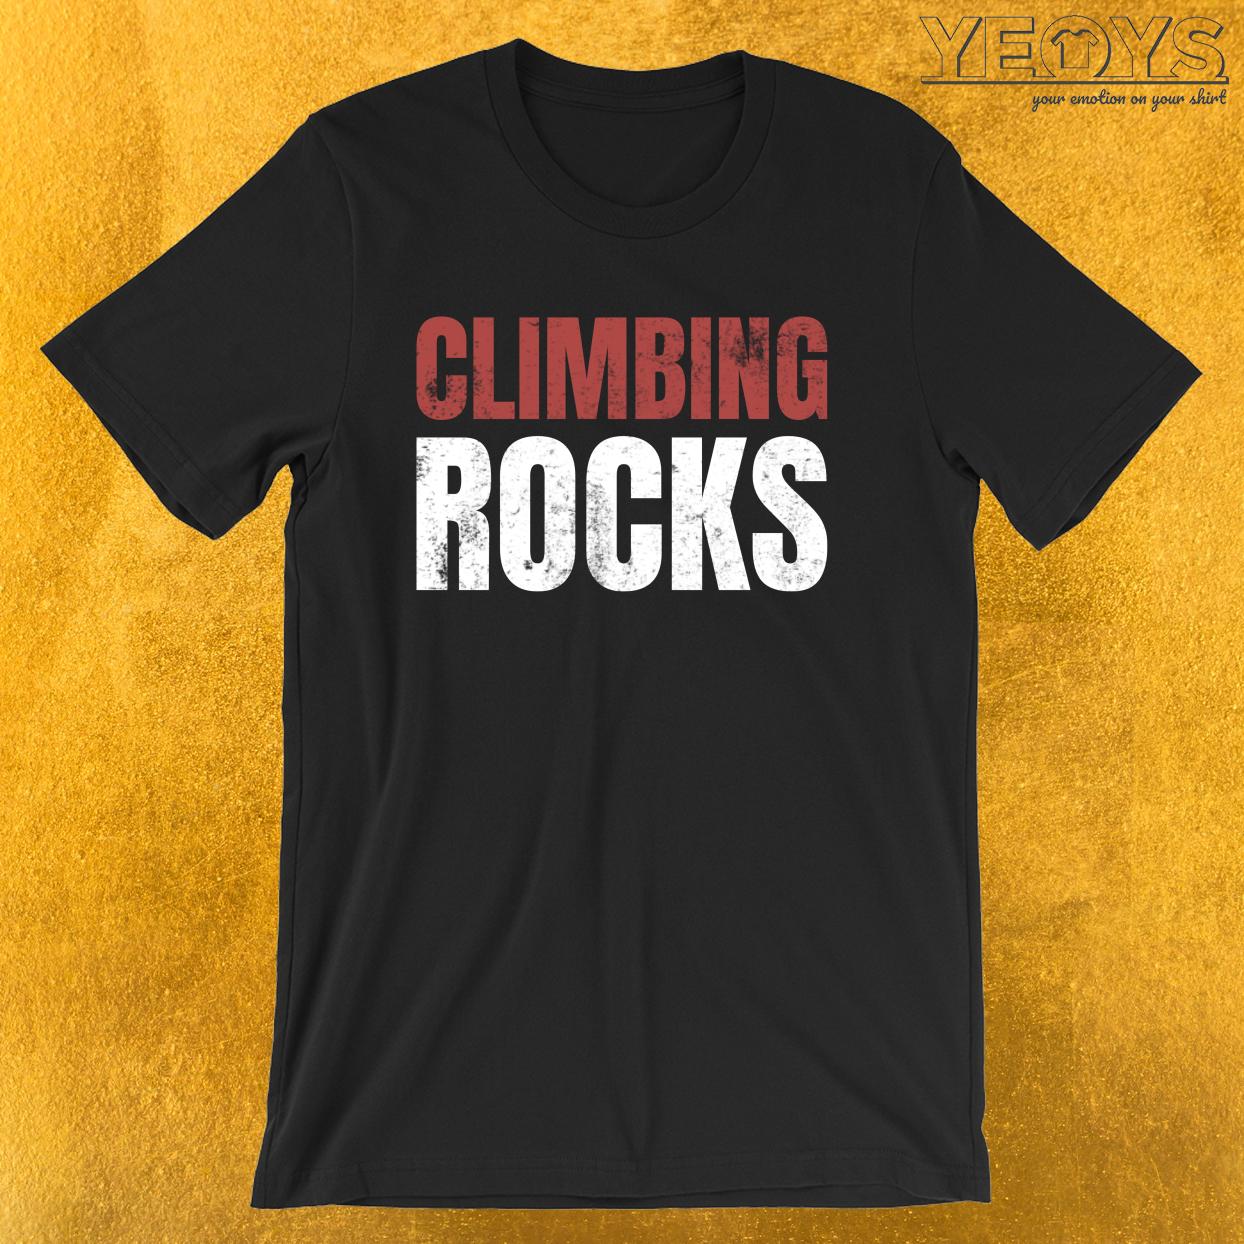 Climbing Rocks – Climbing & Boulder Tee